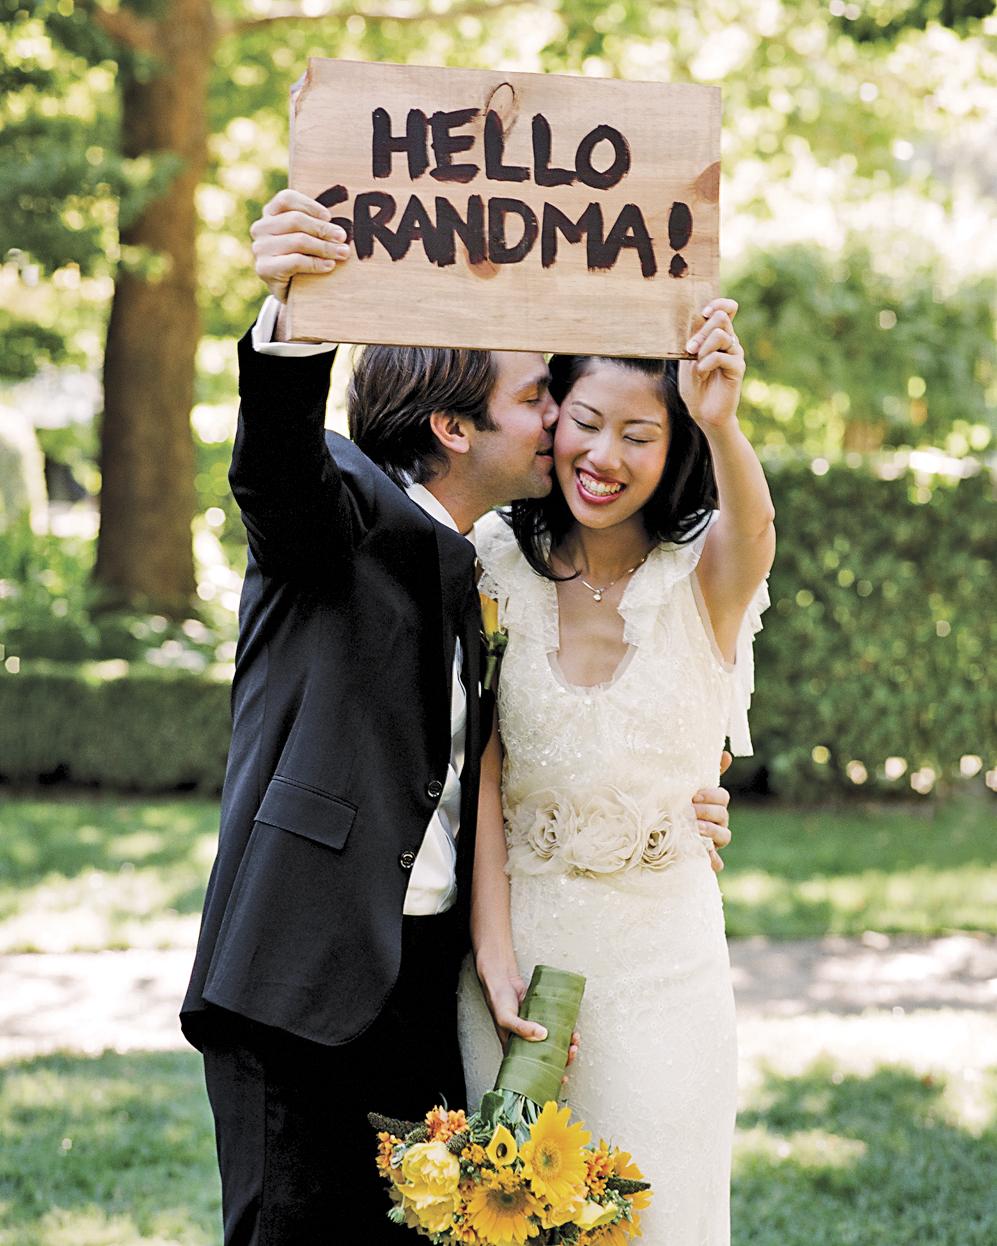 include-mothers-jennifer-james-wedding-sign-grandma-su09-0515.jpg